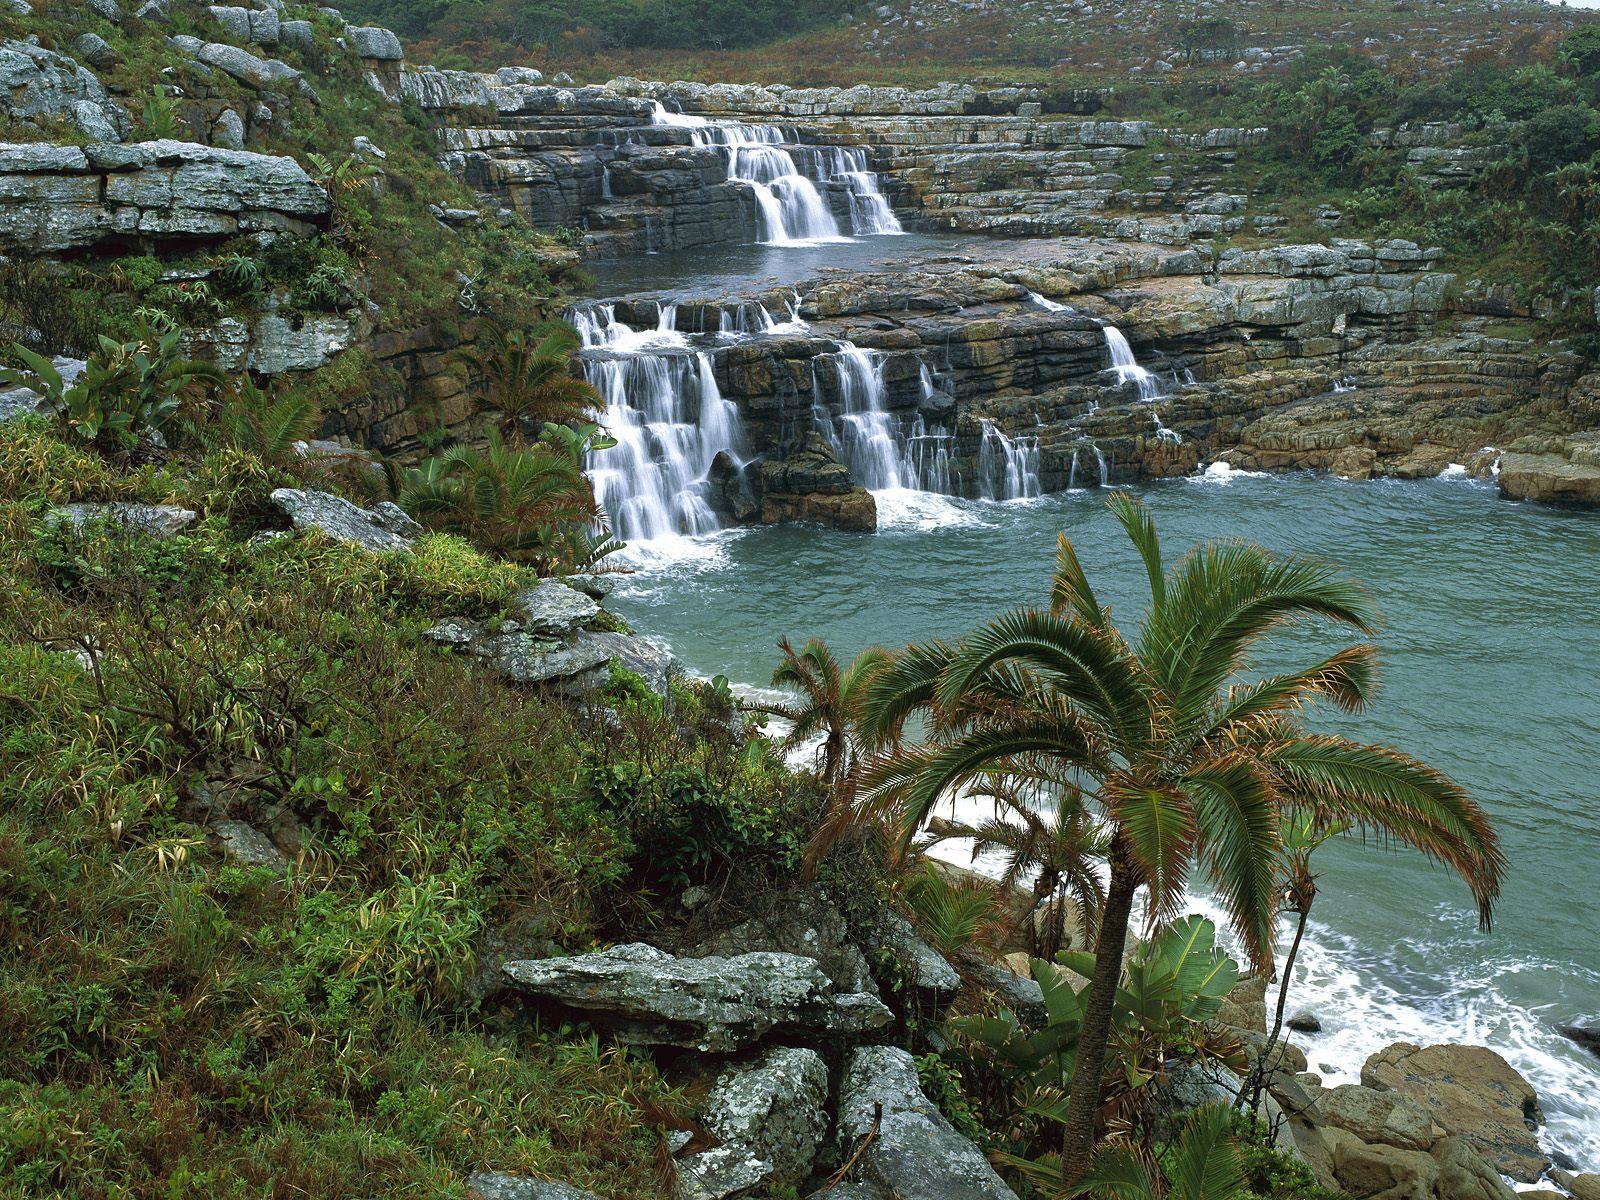 http://3.bp.blogspot.com/-oslJXbIzqAs/Tir-Rncka1I/AAAAAAAAAv0/L3-3_Hynujw/s1600/Mkambati_Nature_Reserve_Pondoland_Coast_South_Africa.jpg